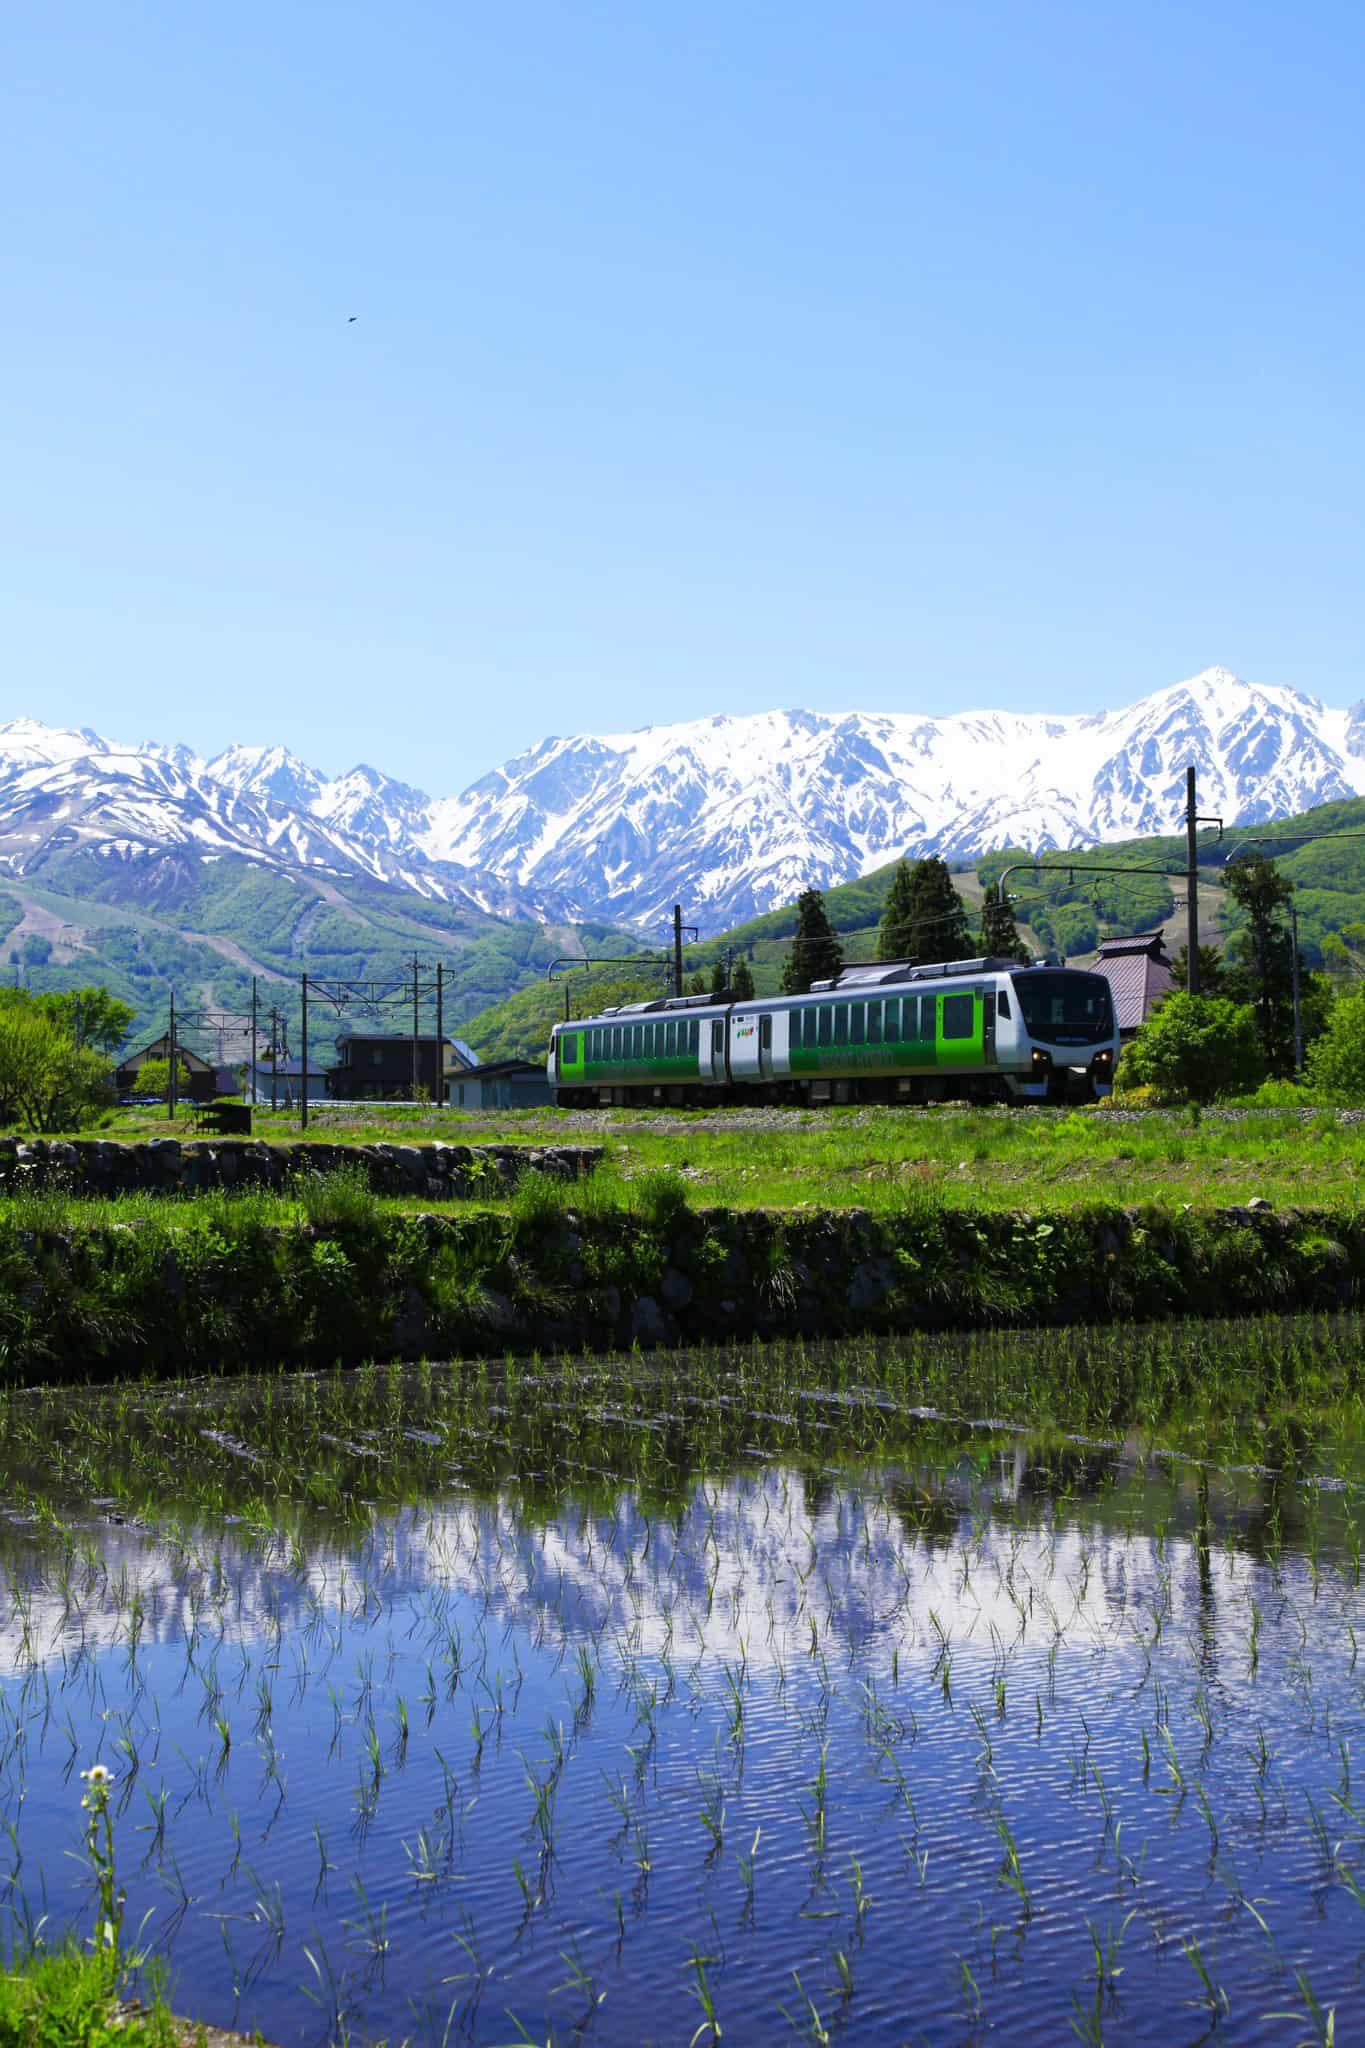 Joyful train - วิวระหว่างสถานี Matsumoto จวบจนถึงสถานี Hakuba